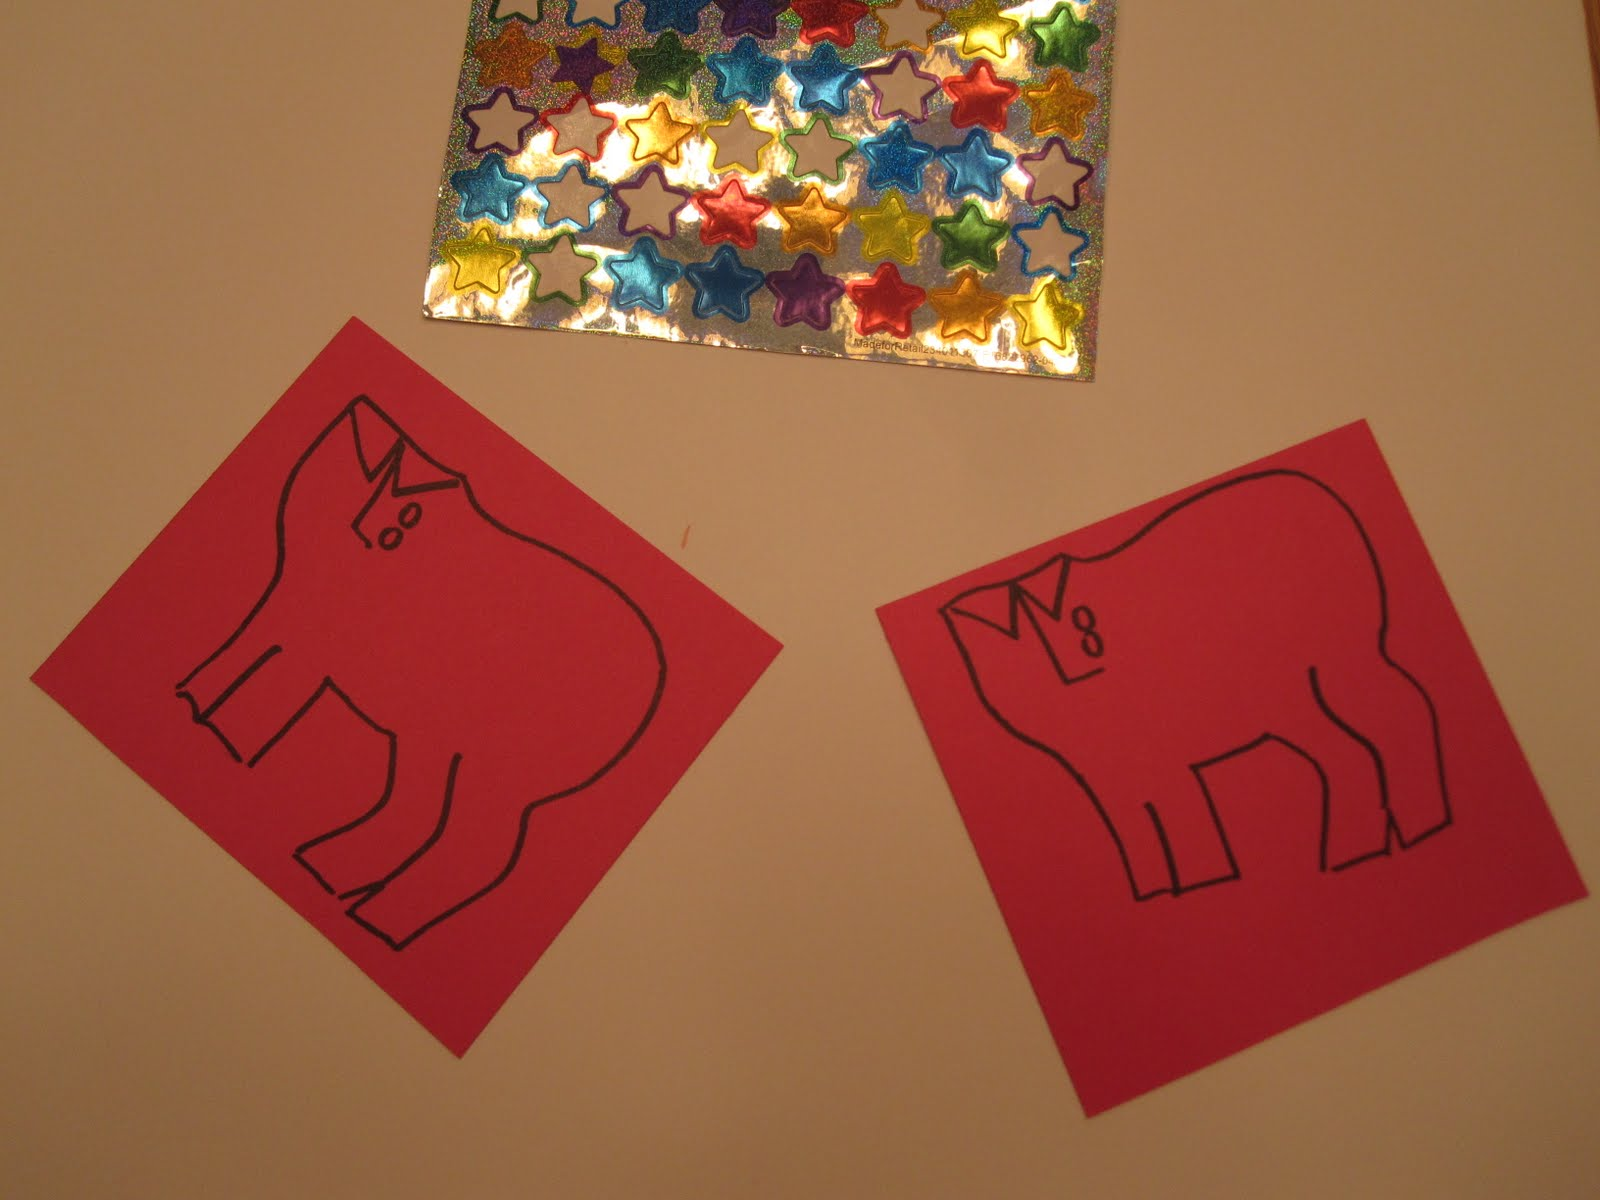 toddler approved read across america book week llama llama red